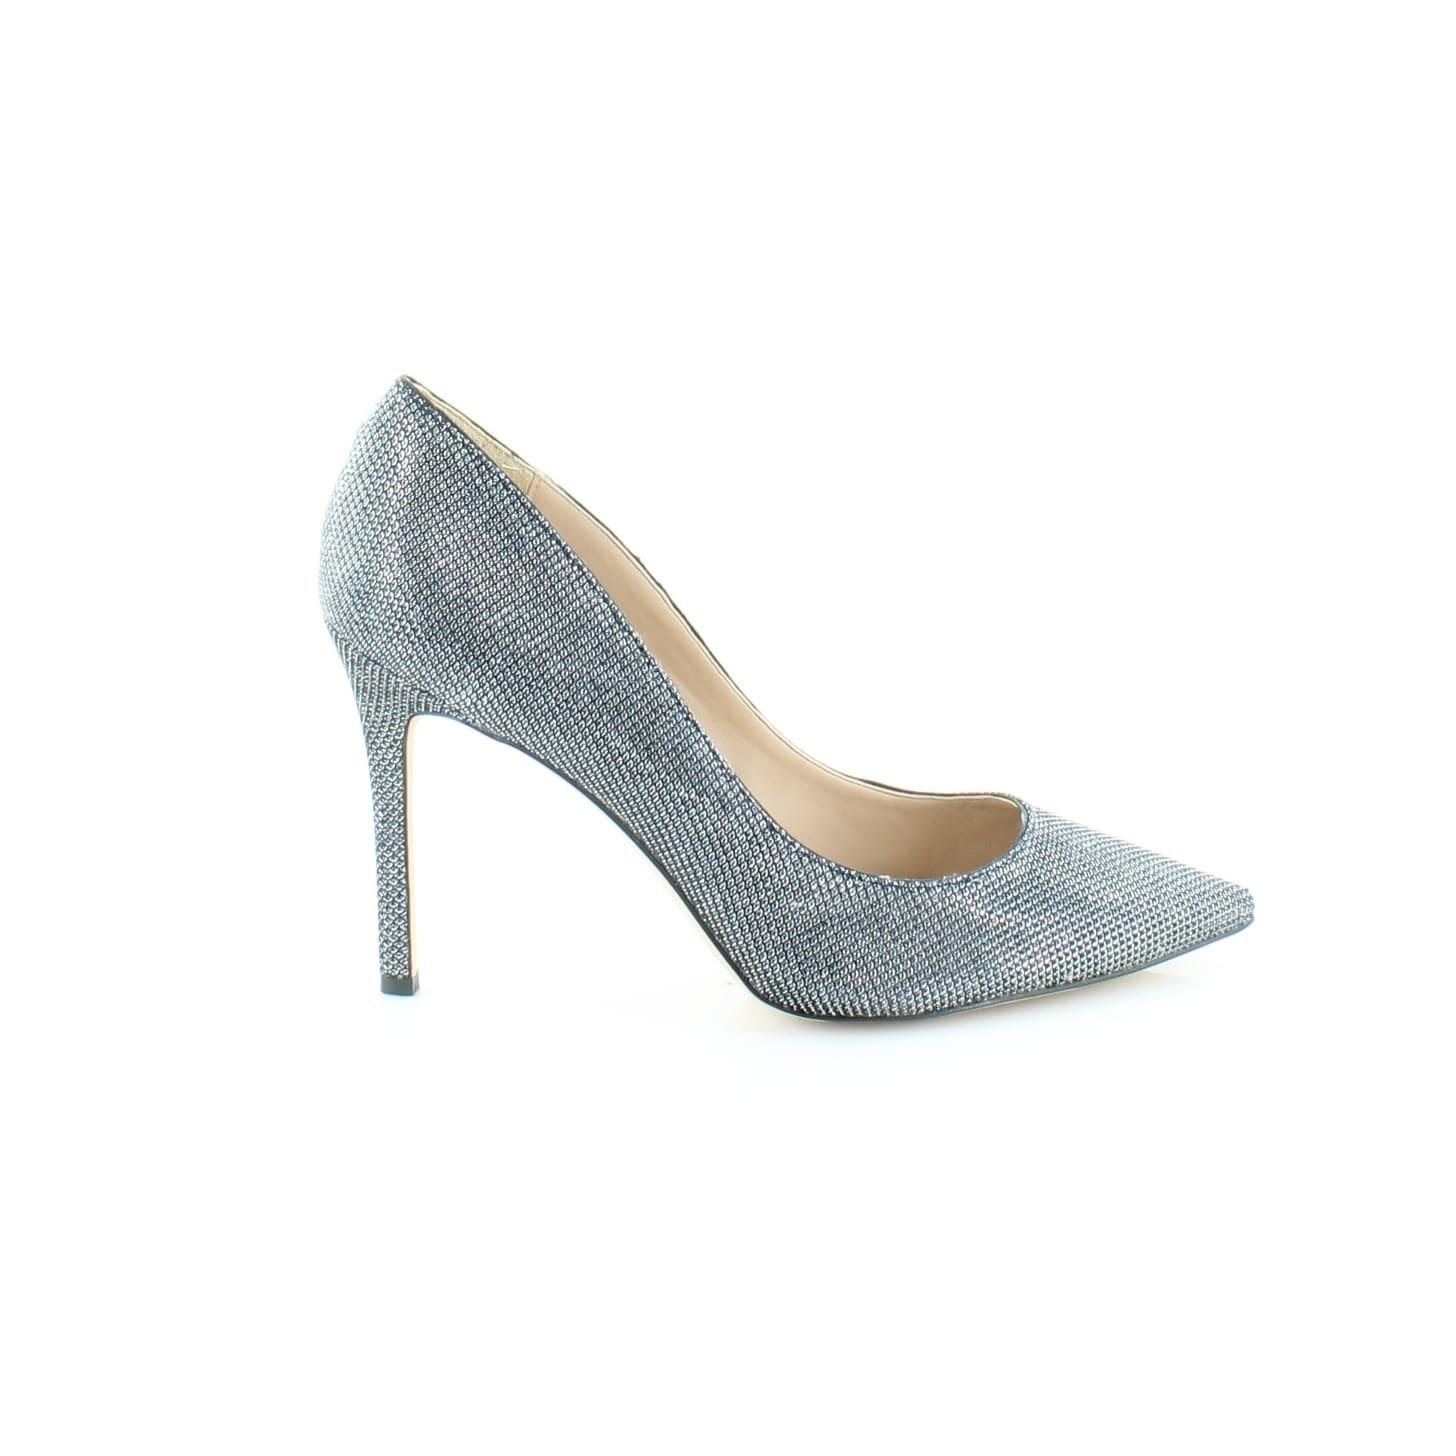 1f25bd08eced Shop Sam Edelman Hazel Women s Heels Blue Met Mesh - Free Shipping Today -  Overstock - 25582820